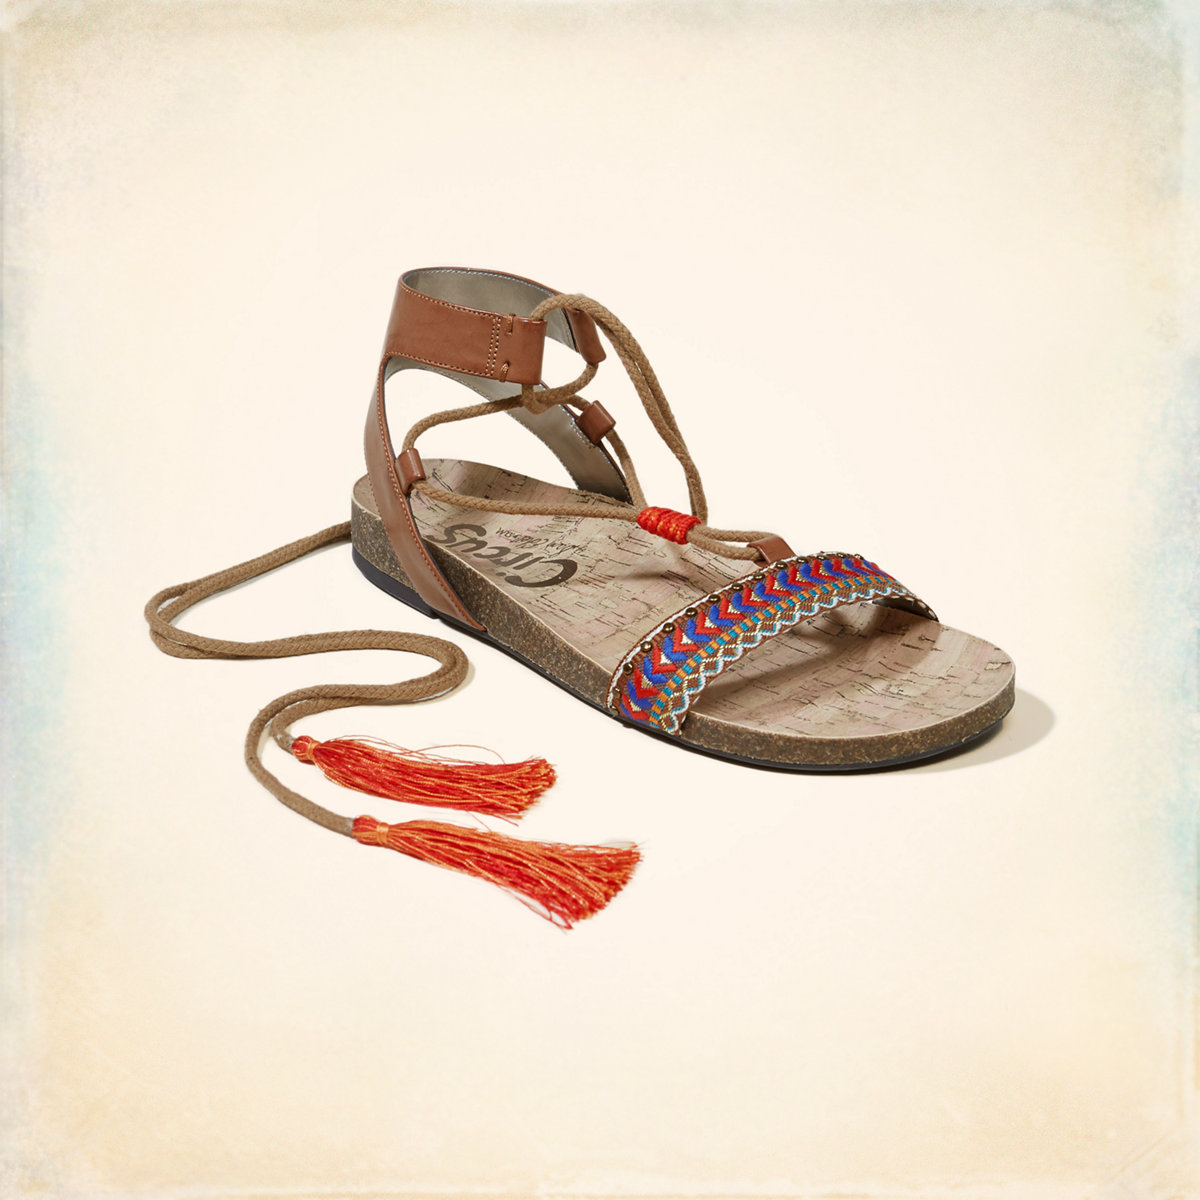 Circus By Sam Edelman Kerri Wrap Sandal